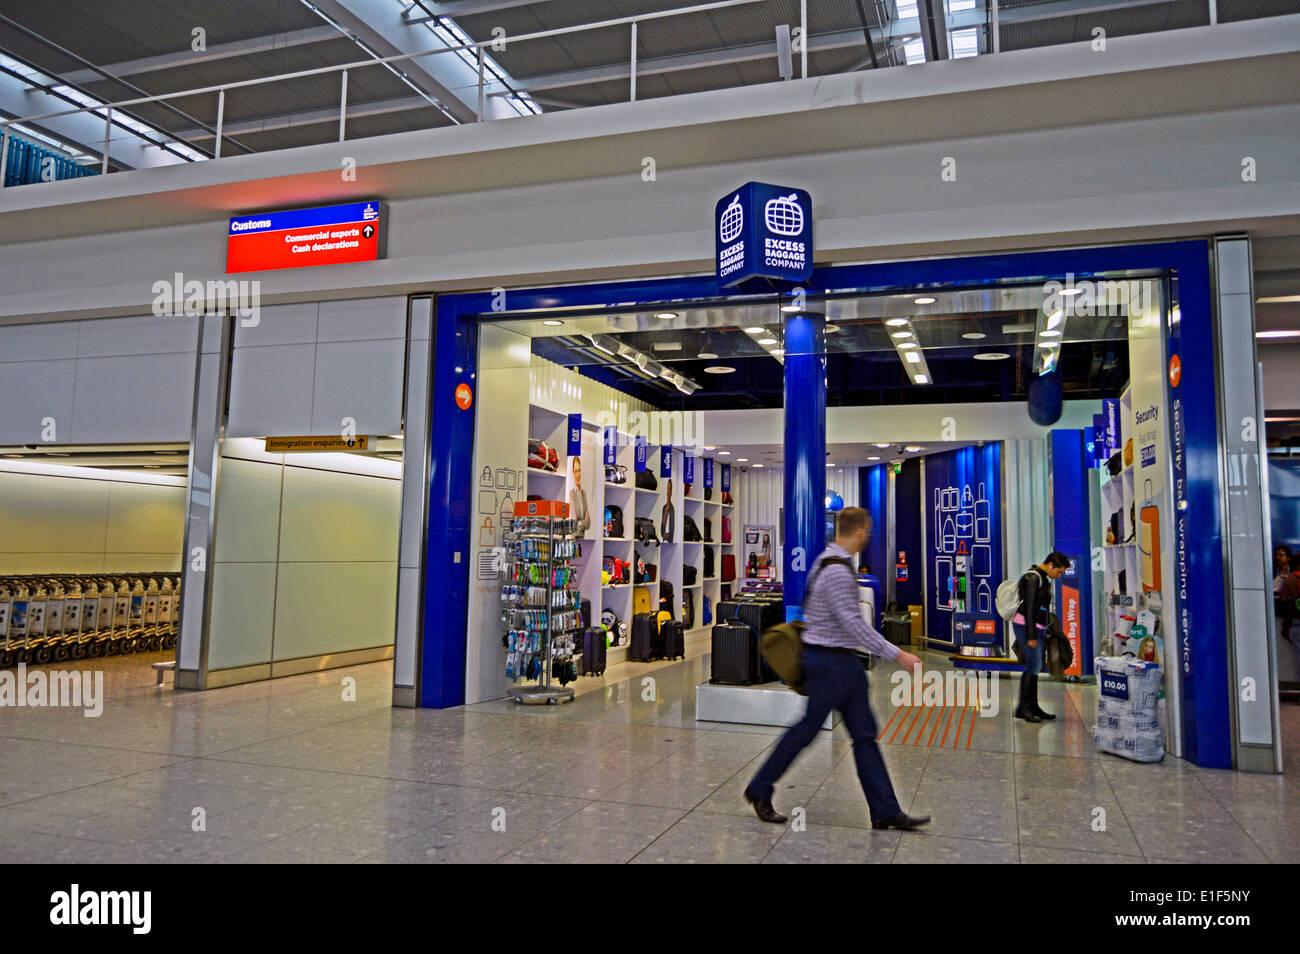 Excess Baggage Company, Terminal 5 Departures, Heathrow Airport, London Borough of Hillingdon, London, England, United Kingdom - Stock Image